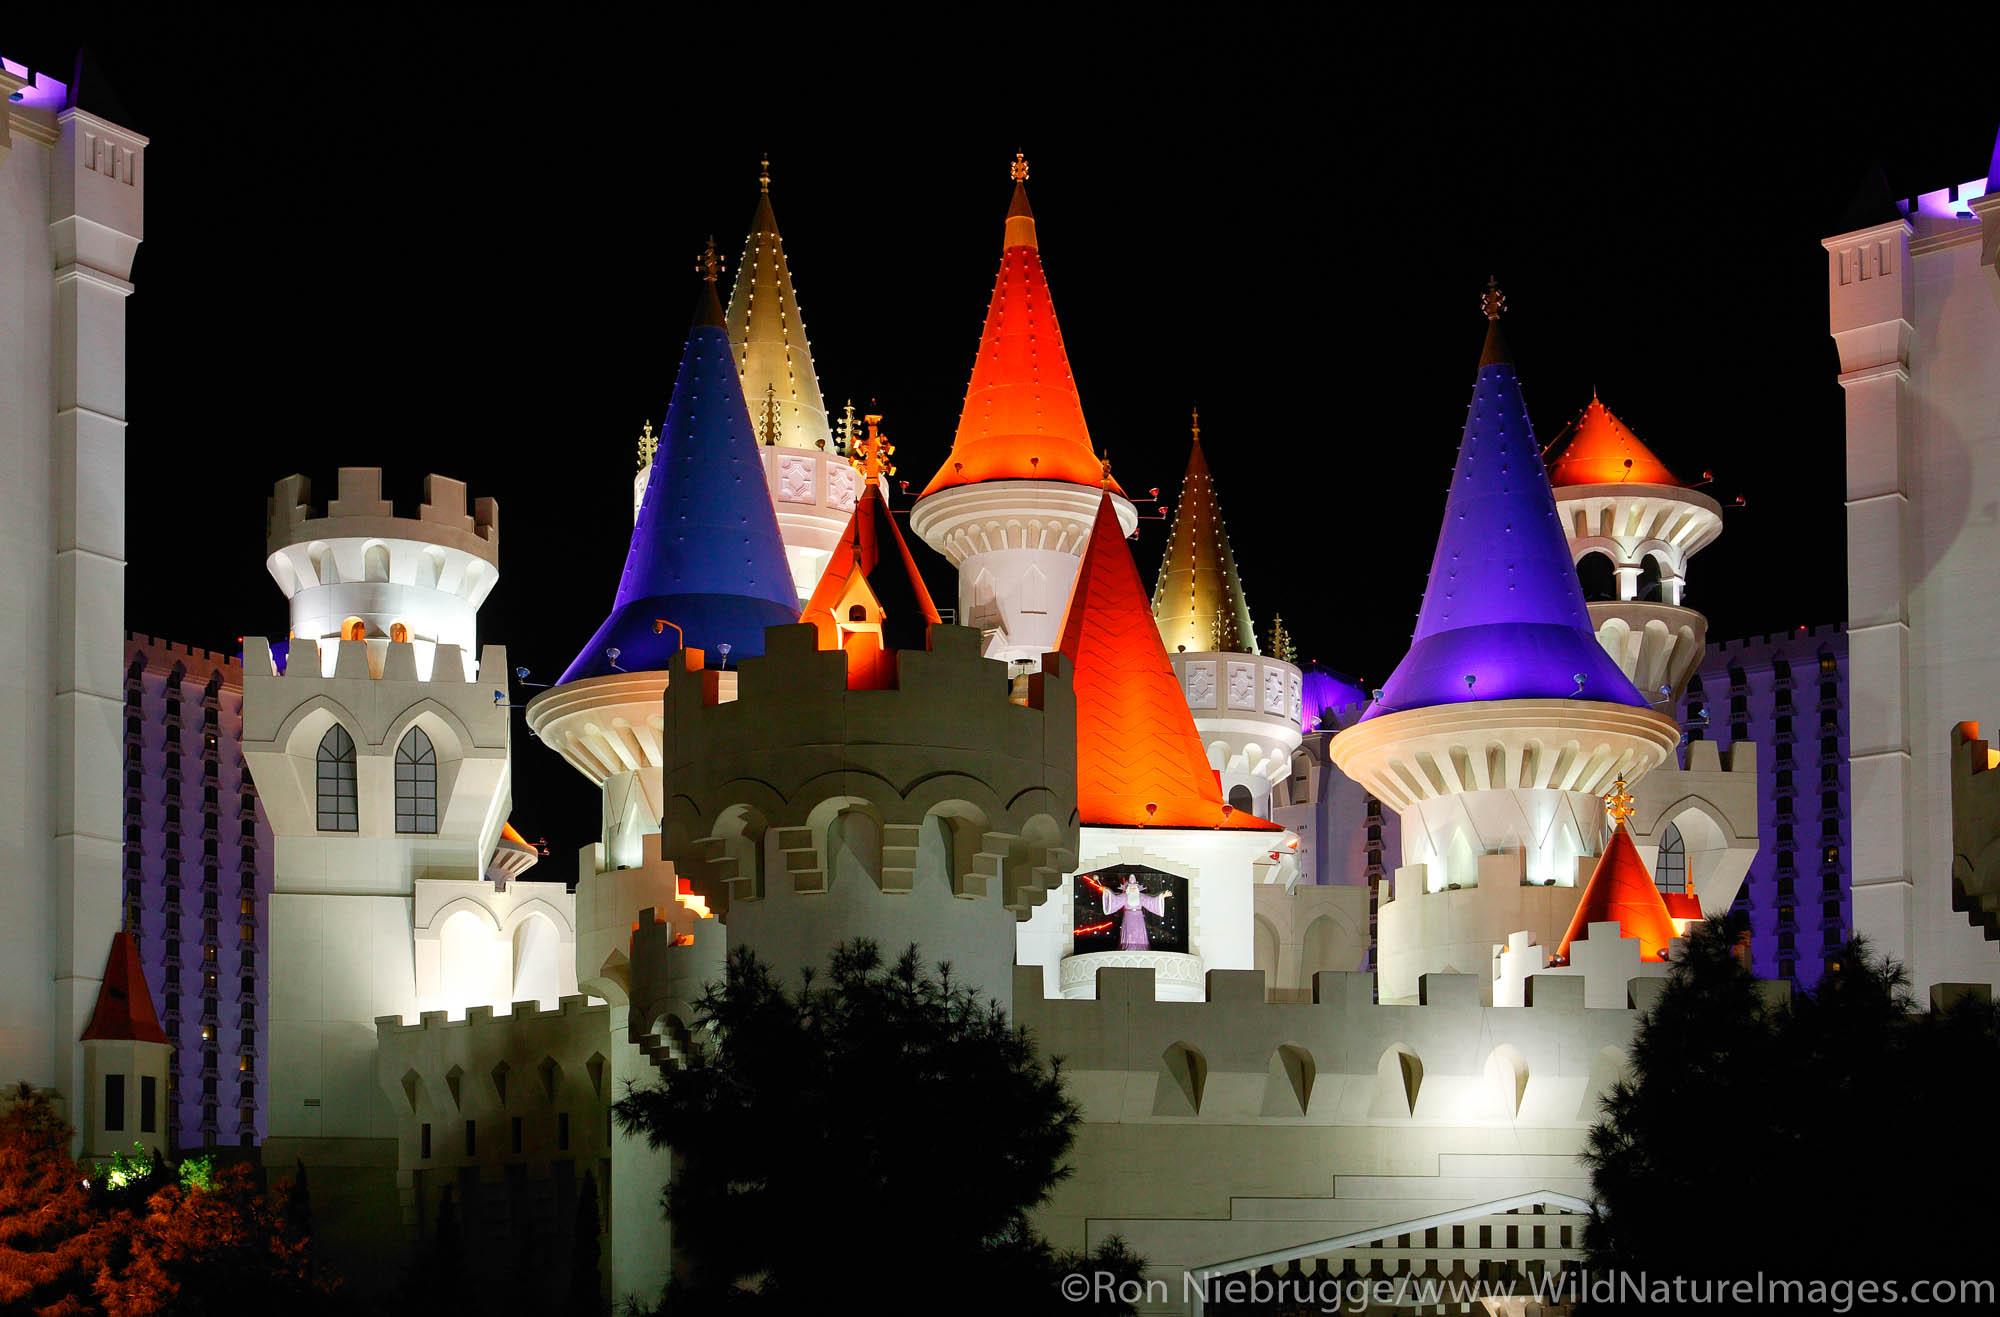 The Excaliber Casino and Hotel, Las Vegas, Nevada.